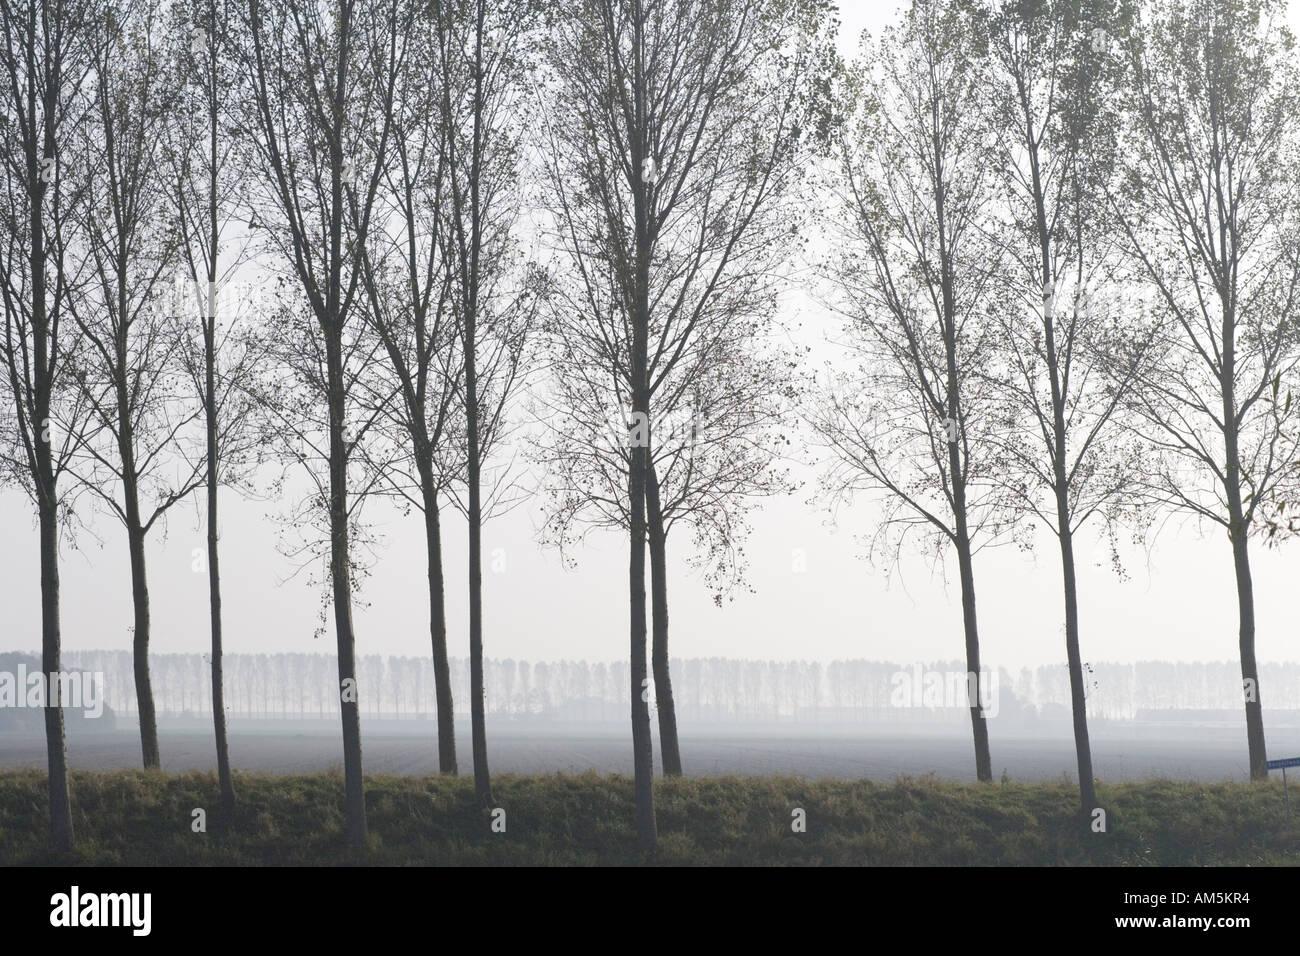 https://c7.alamy.com/comp/AM5KR4/poplars-as-wind-barrier-on-a-levee-or-dyke-or-dike-around-a-polder-AM5KR4.jpg